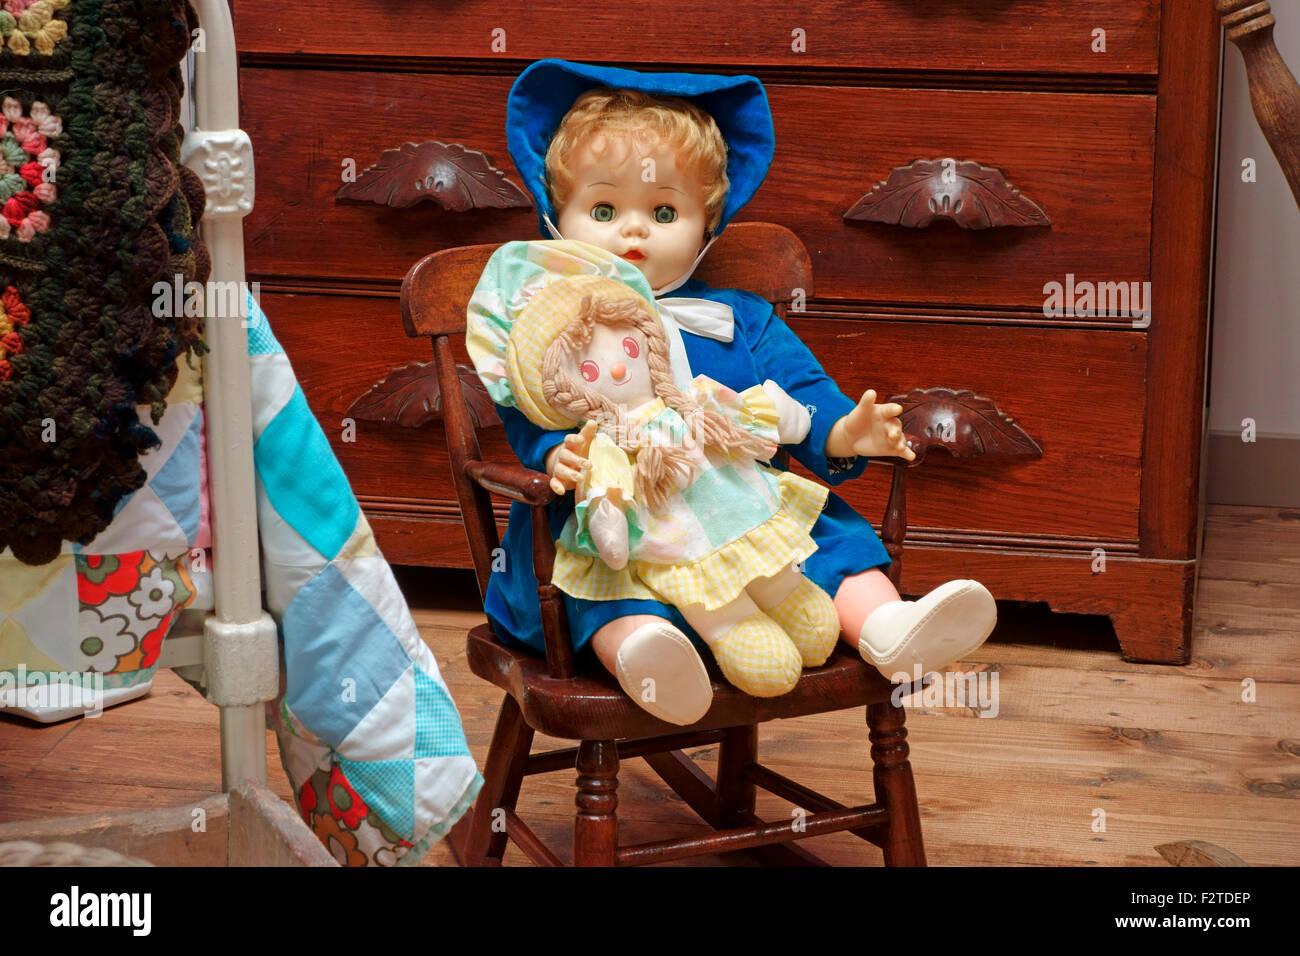 Sedia A Dondolo Per Bambini Mista : Baby dolls immagini baby dolls fotos stock alamy